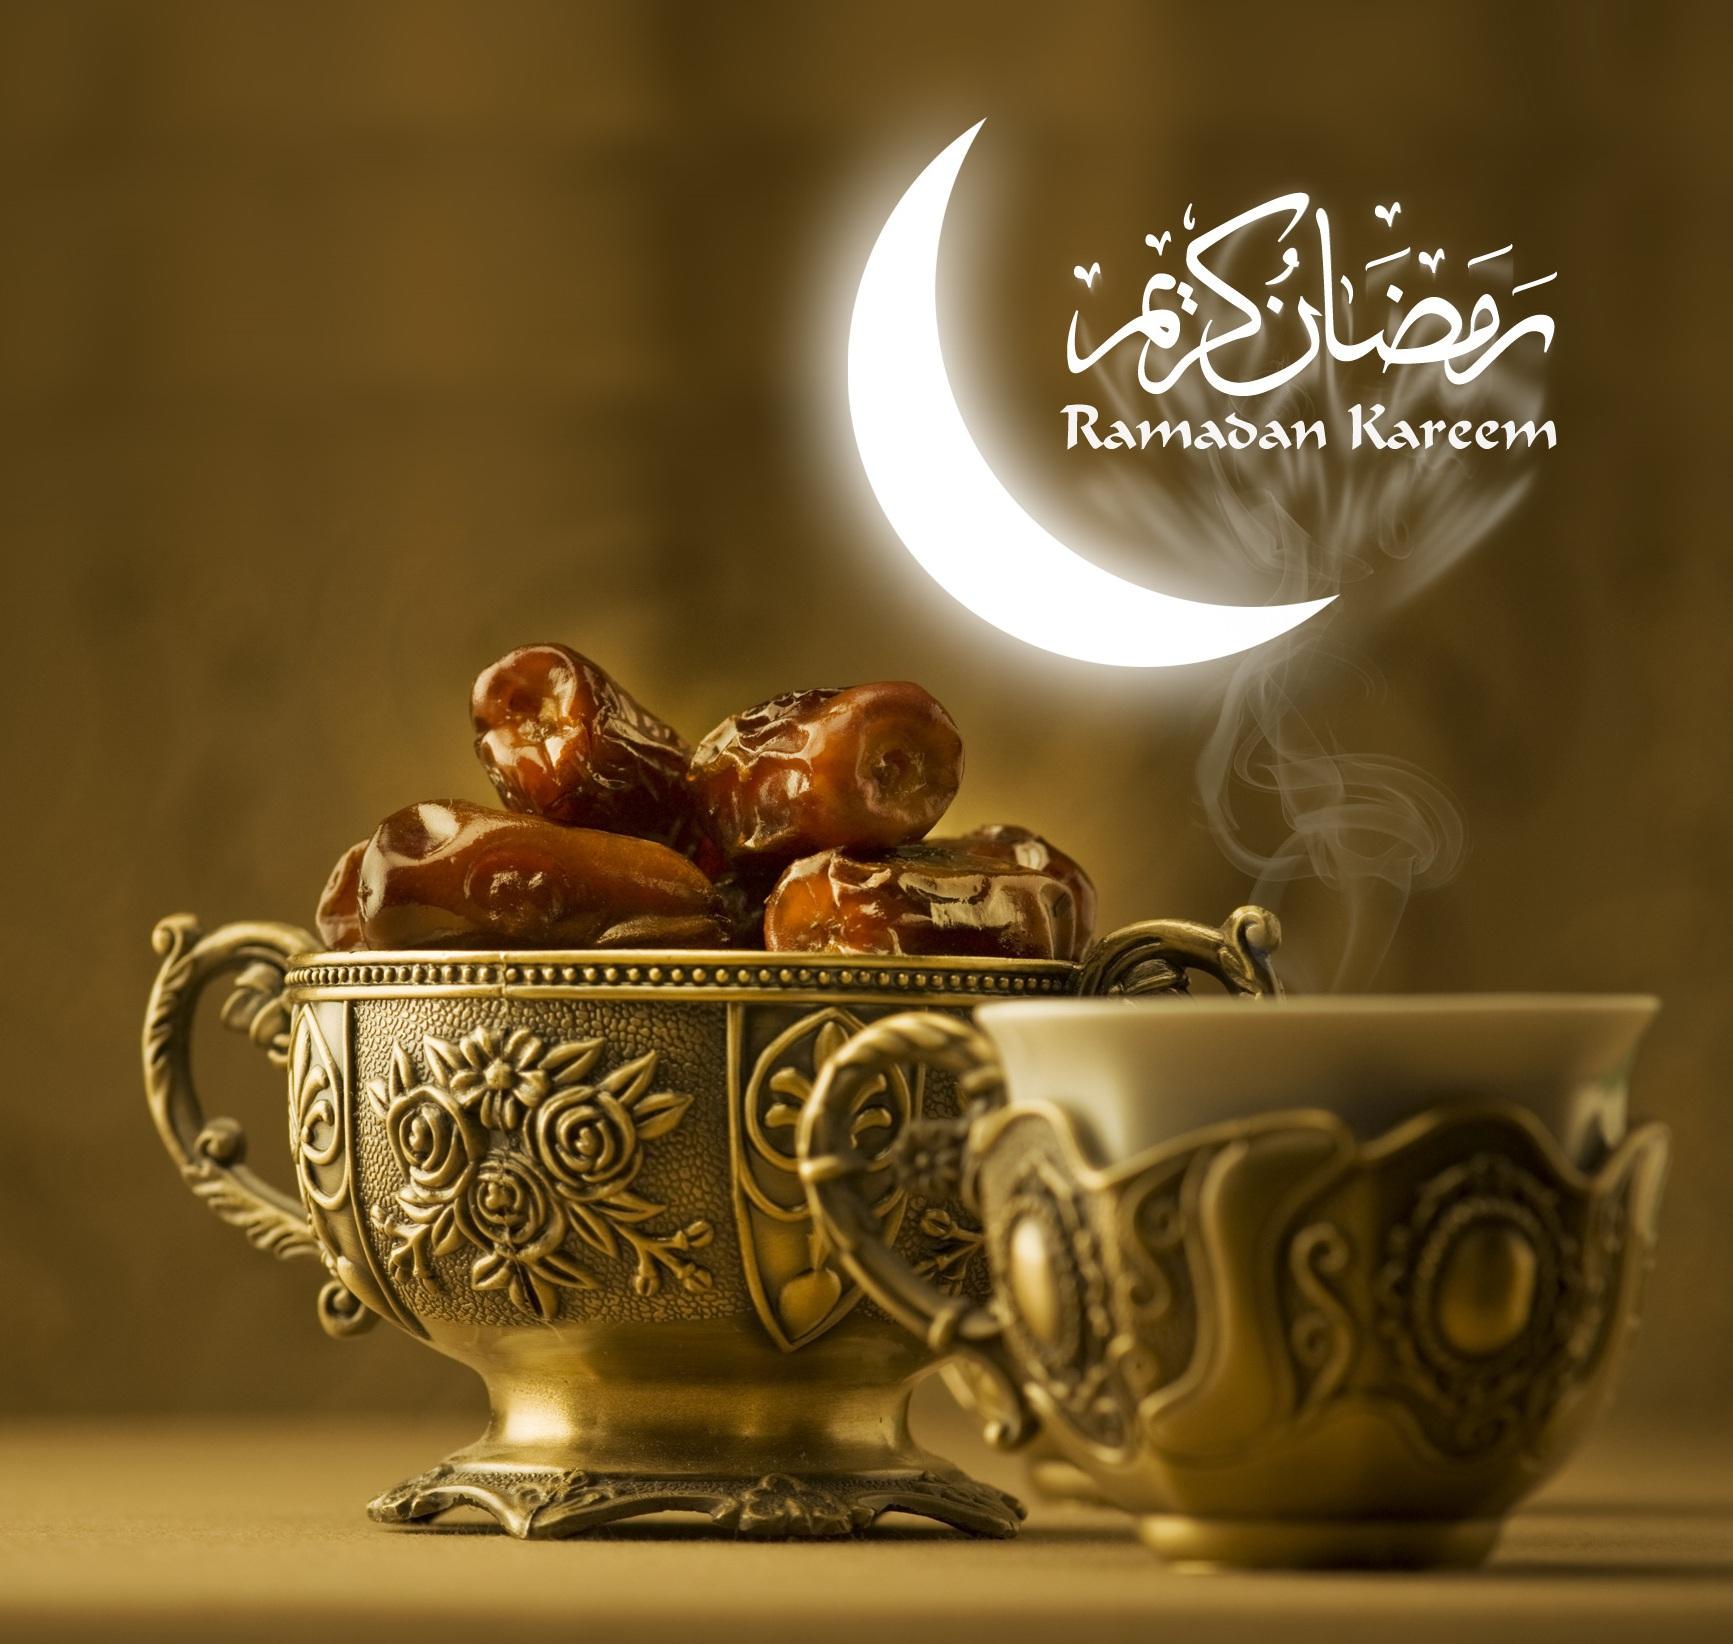 Photo of الصيام يقين والتزام رمضان.. دورة تدريبية على الصبر!